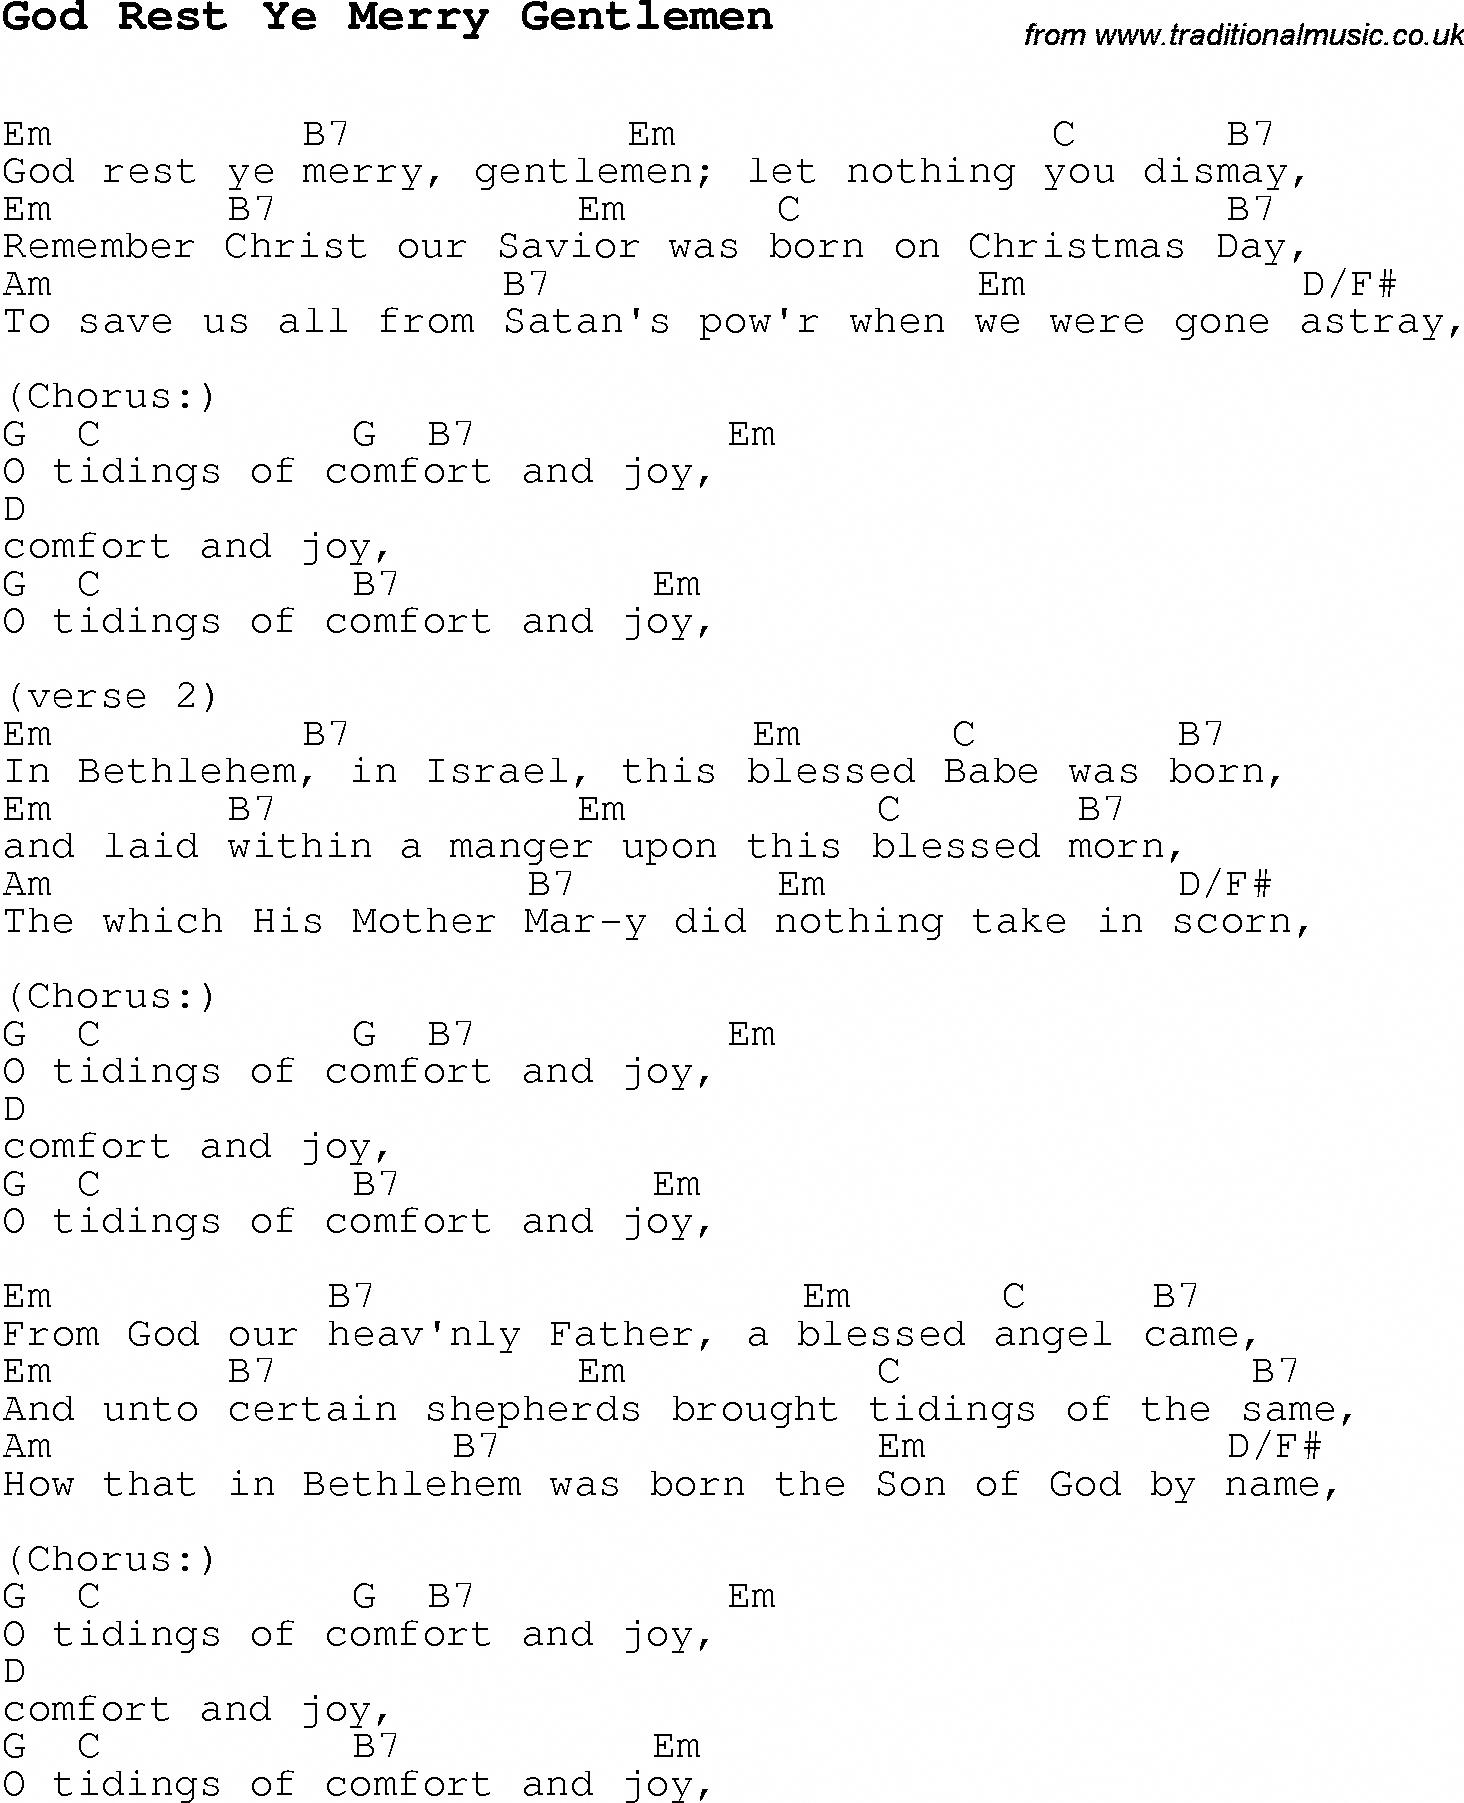 Christmas Songs And Carols Lyrics With Chords For Guitar Banjo For God Rest Ye Merry Gentlemen Ukulele Christmas Carols Songs Christmas Ukulele Ukelele Songs